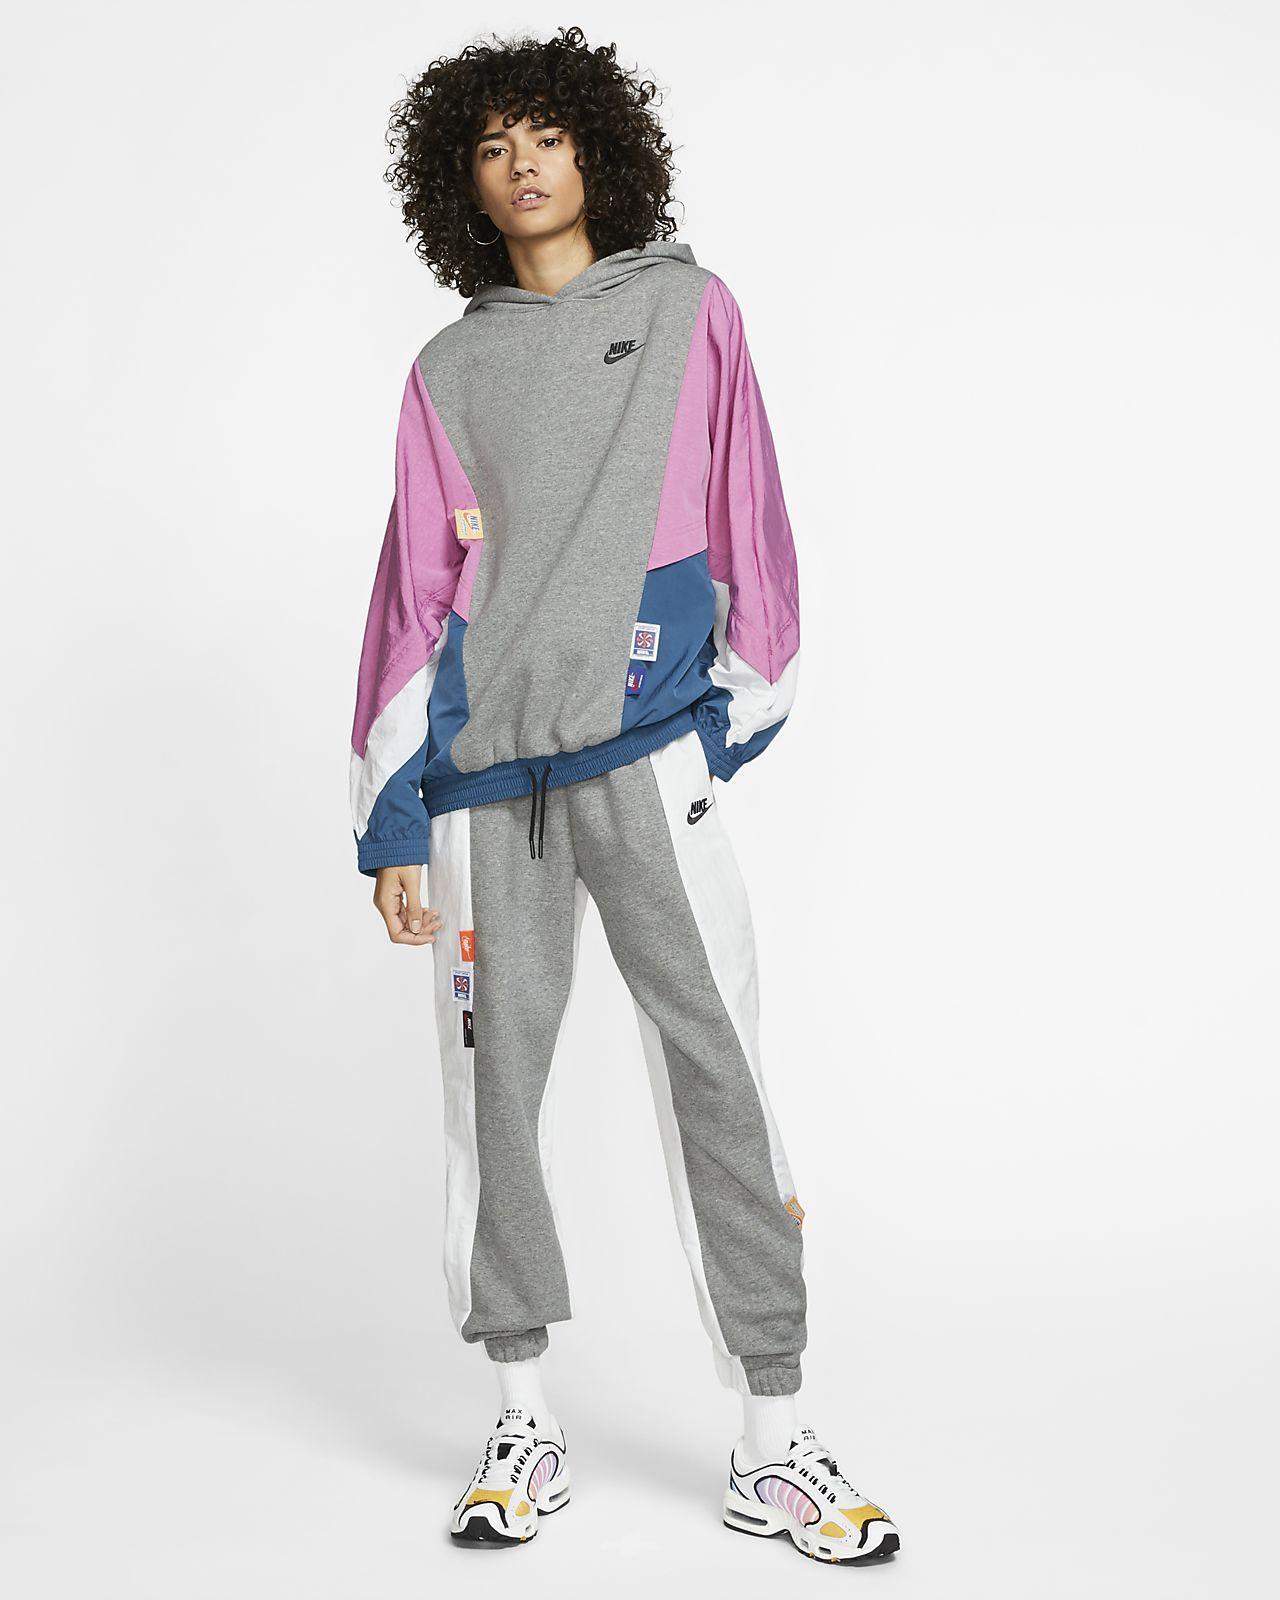 Pin By Miiiii Laa On Looks Tumblrs Adidas Outfit Pullover Hoodie Nike Sportswear [ 1600 x 1280 Pixel ]